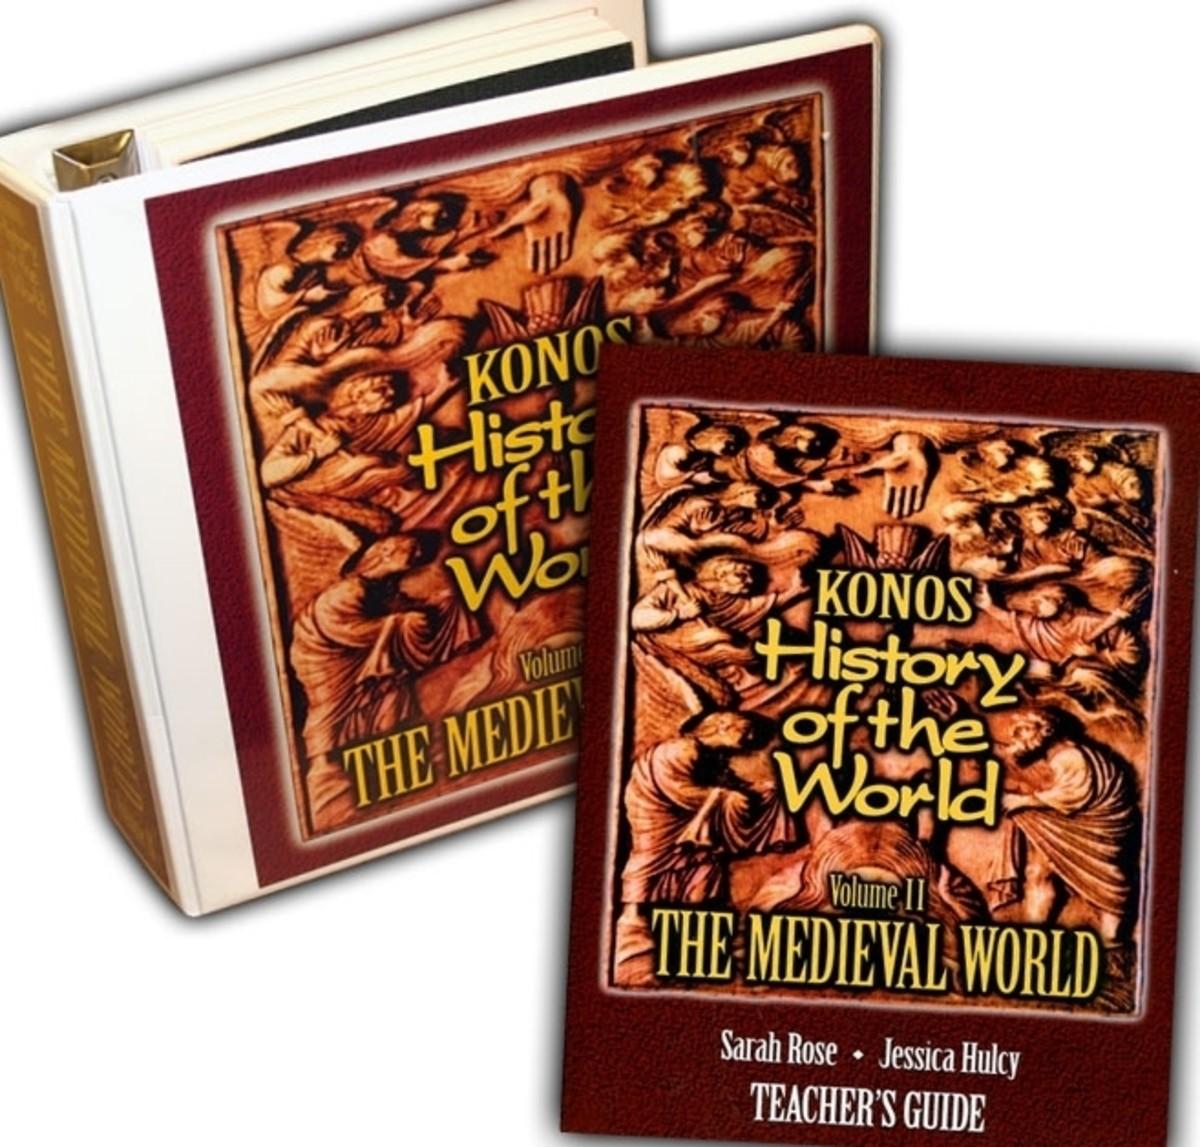 KONOS History of the World Volume II